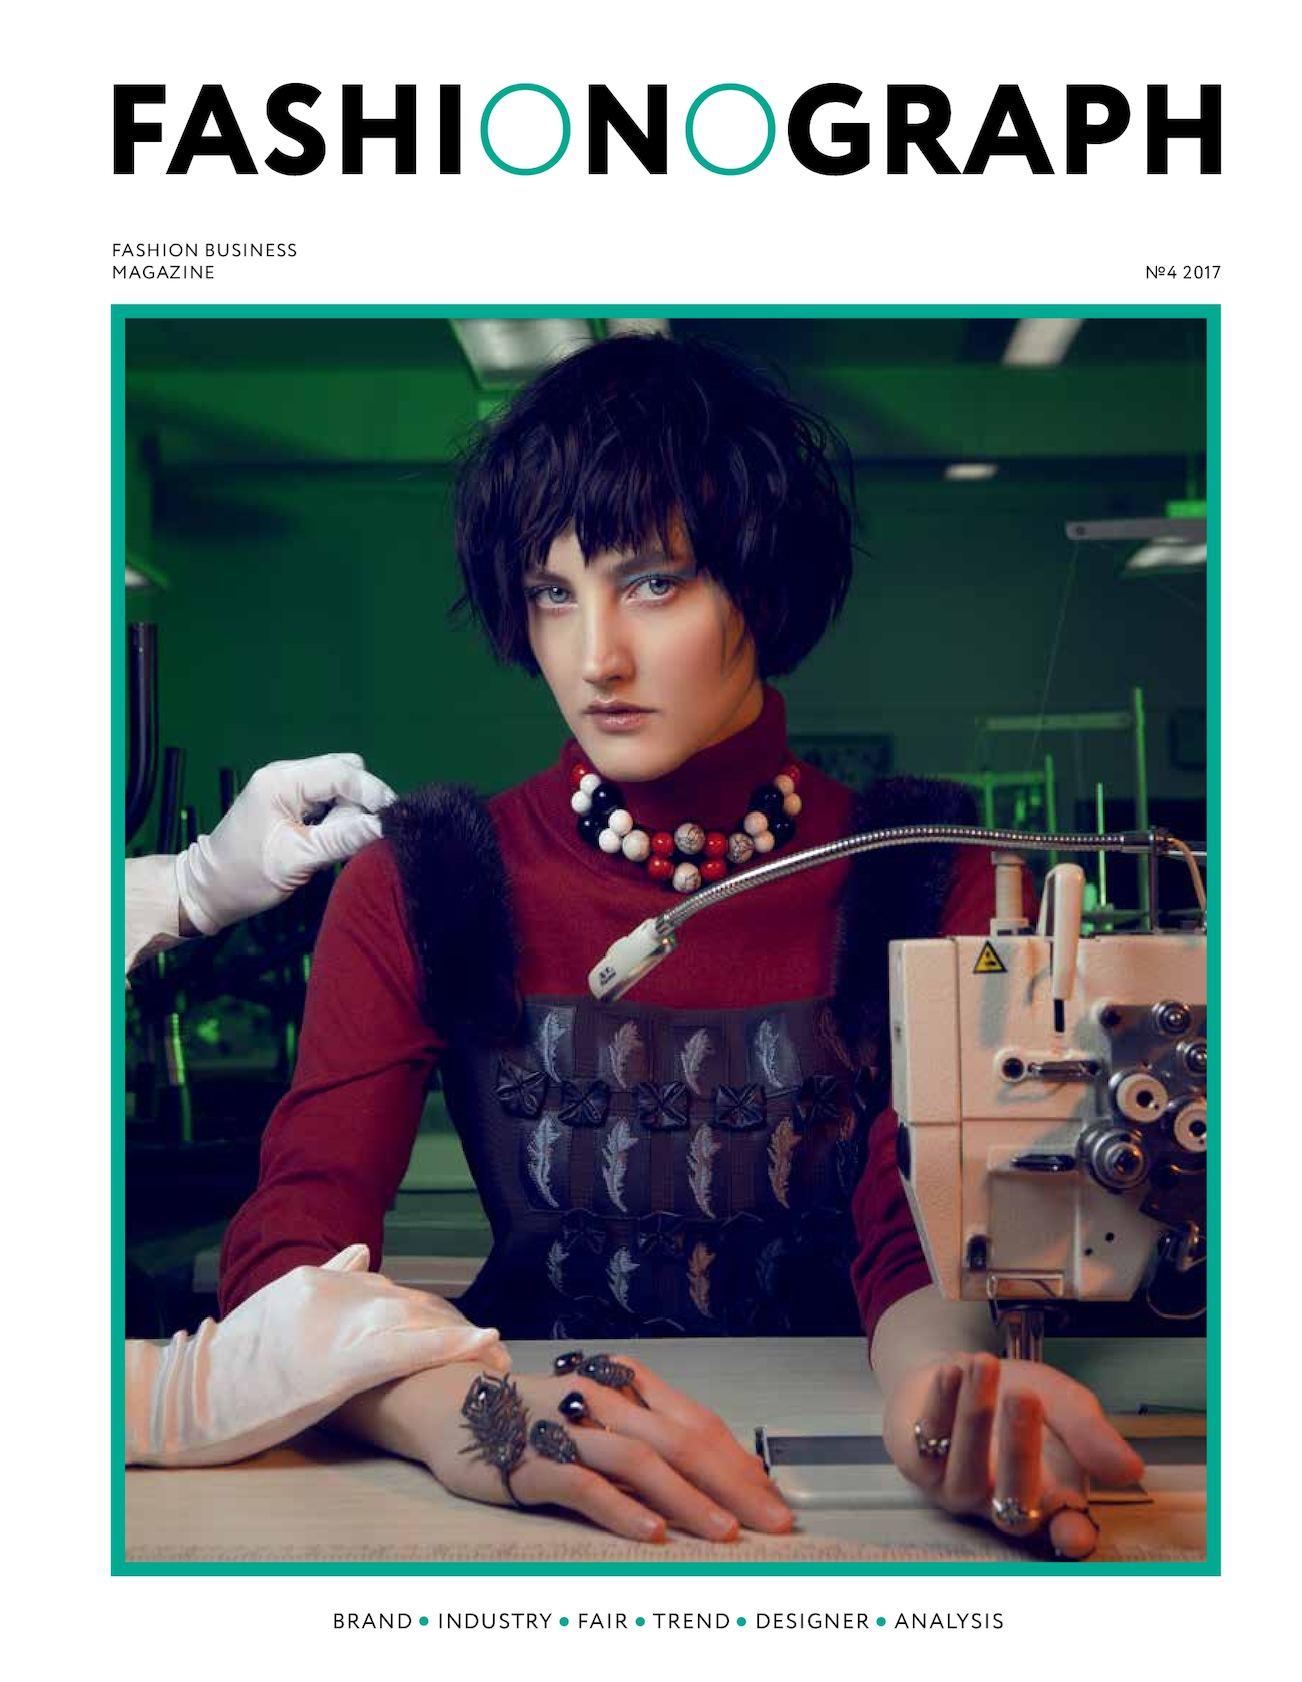 Calaméo - Fashionograph  4 Spring-Summer 2017 cdc8fdd481fa5